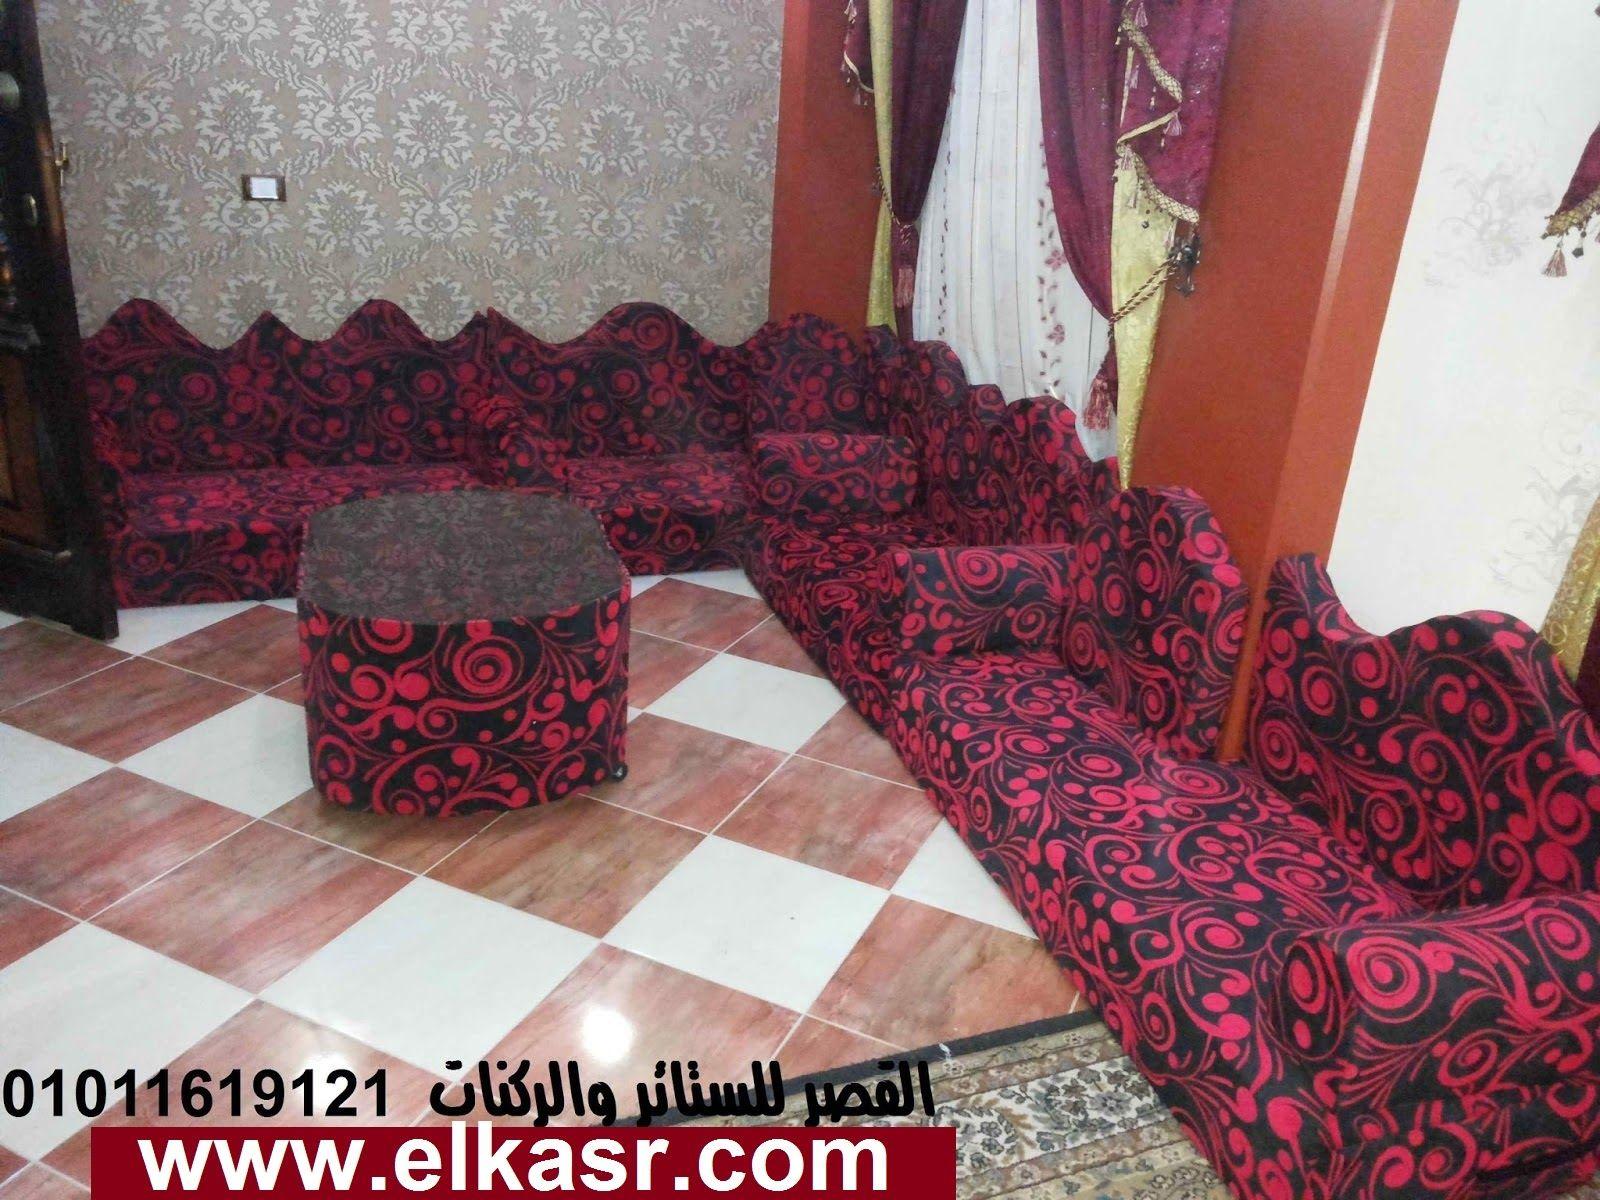 القصر للستائر والركنات Decor Home Decor Furniture